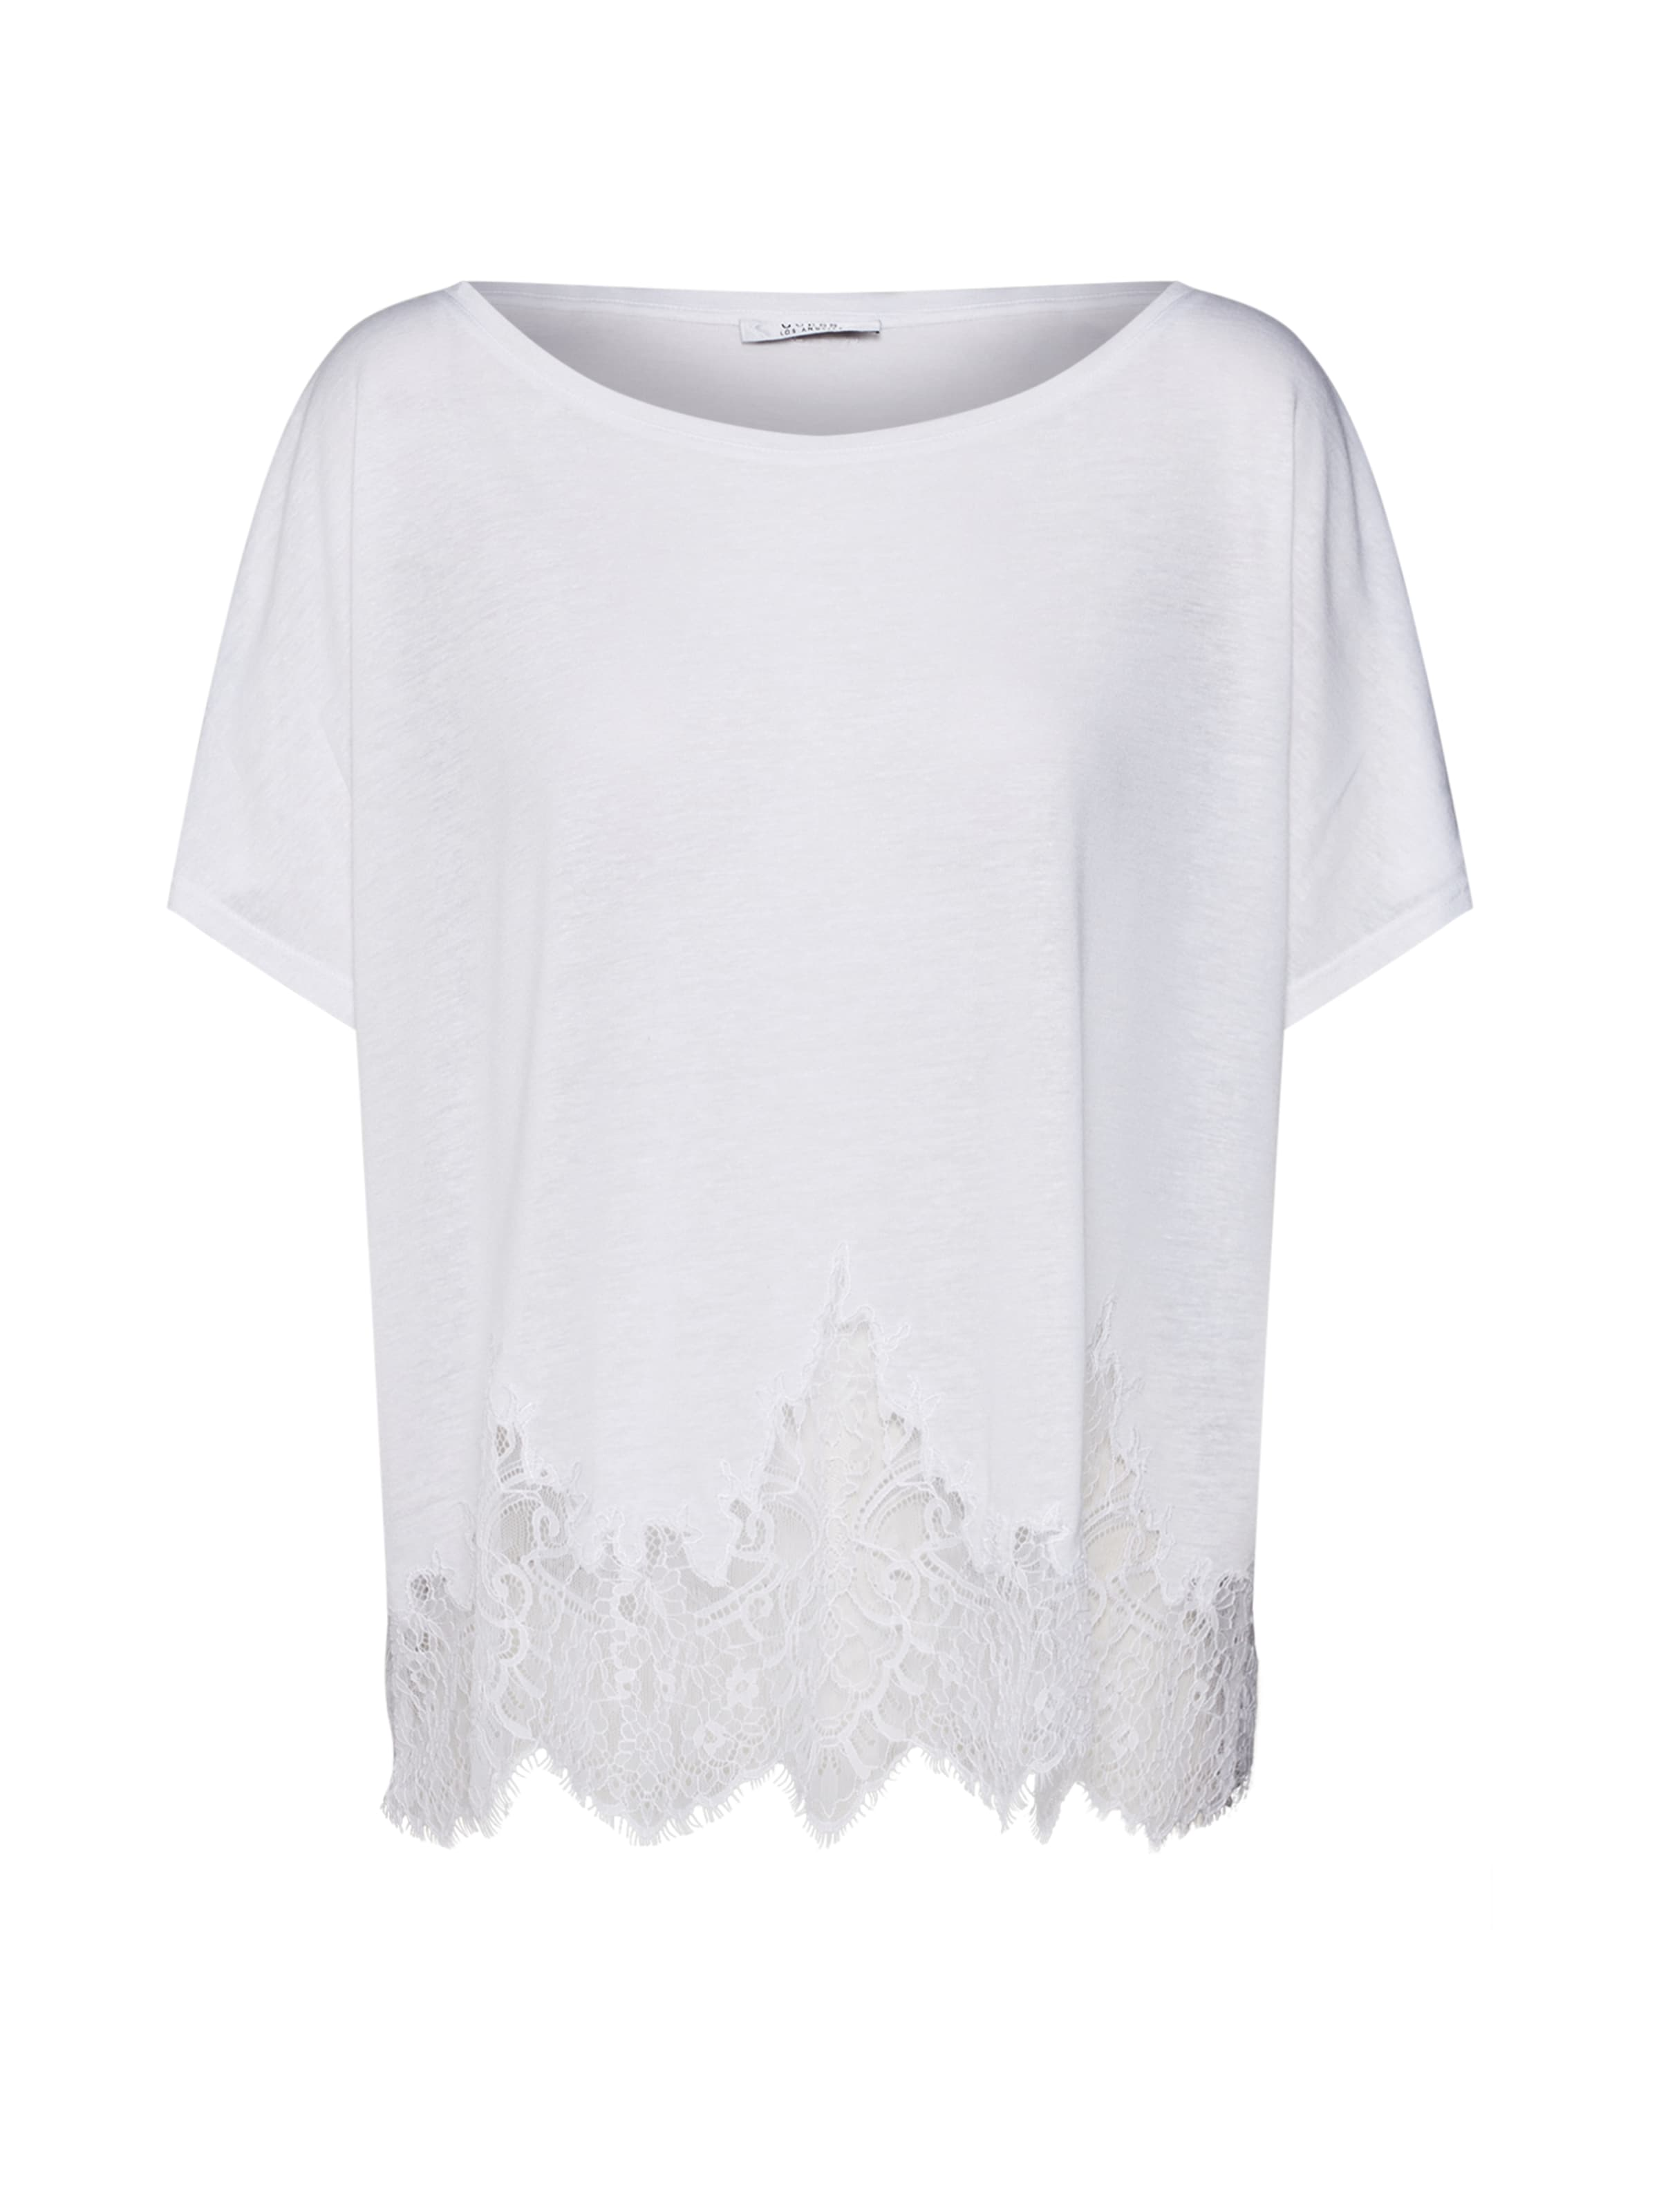 T Guess 'nara' En Blanc shirt Ybf6gvI7ym